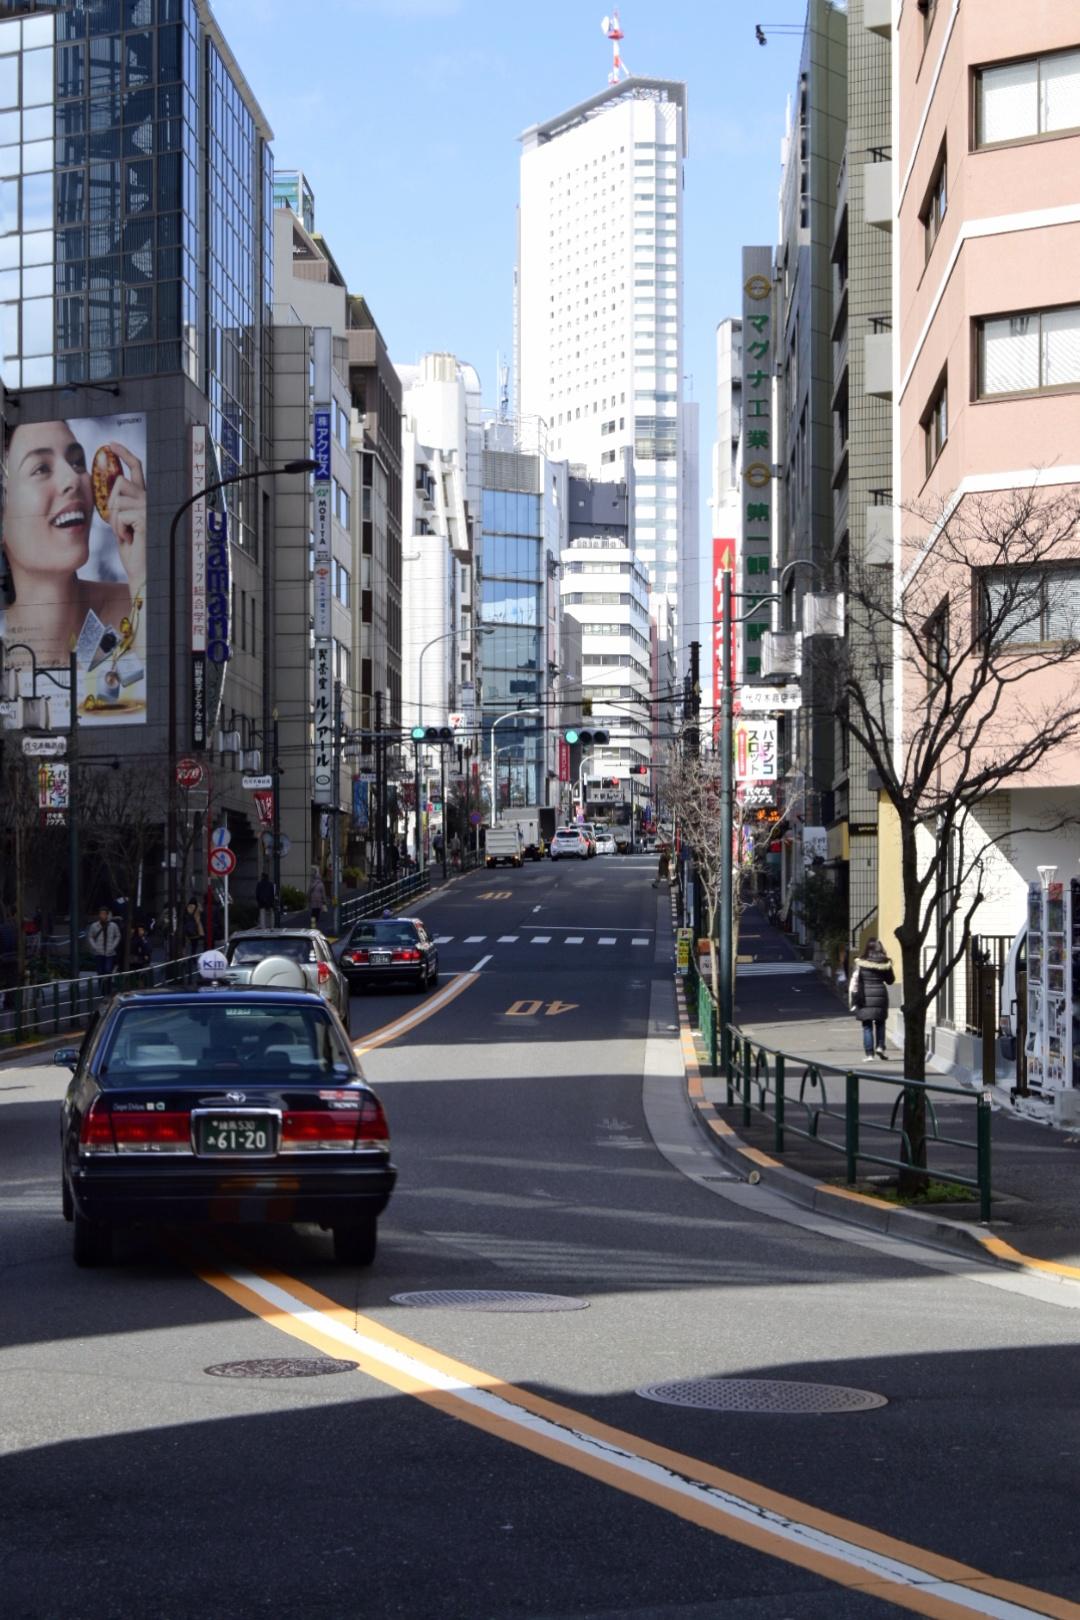 Street in Yoyogi